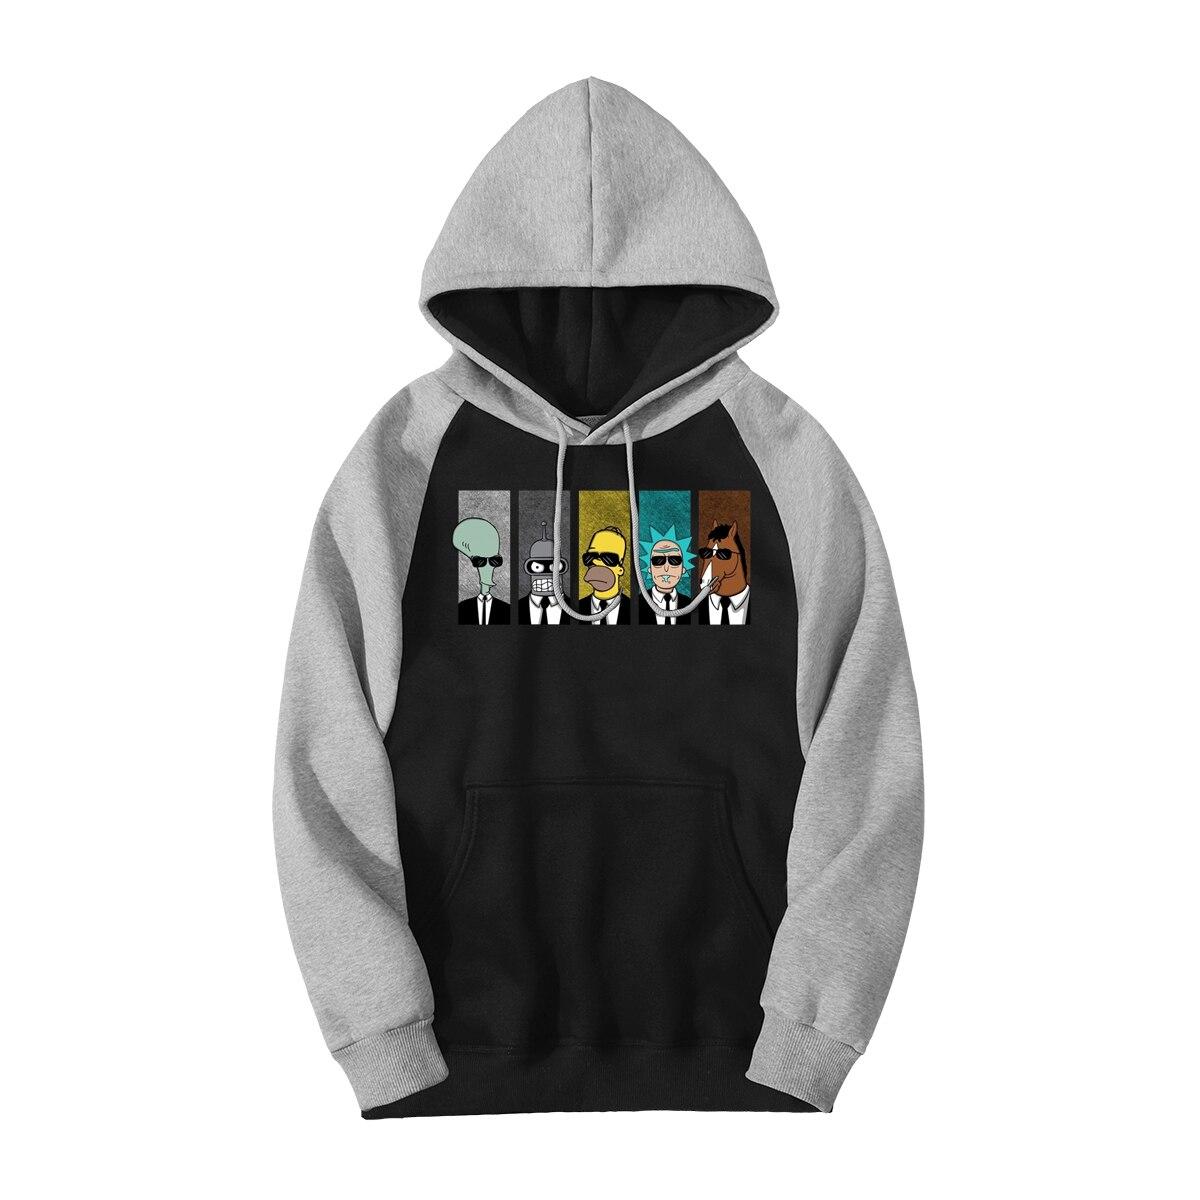 Rick Morty Raglan Men Hoodies BoJack Horseman Funny Fashion Autumn Winter Warm Hooded Tracksuit 2019 New Arrival Prine Jacket